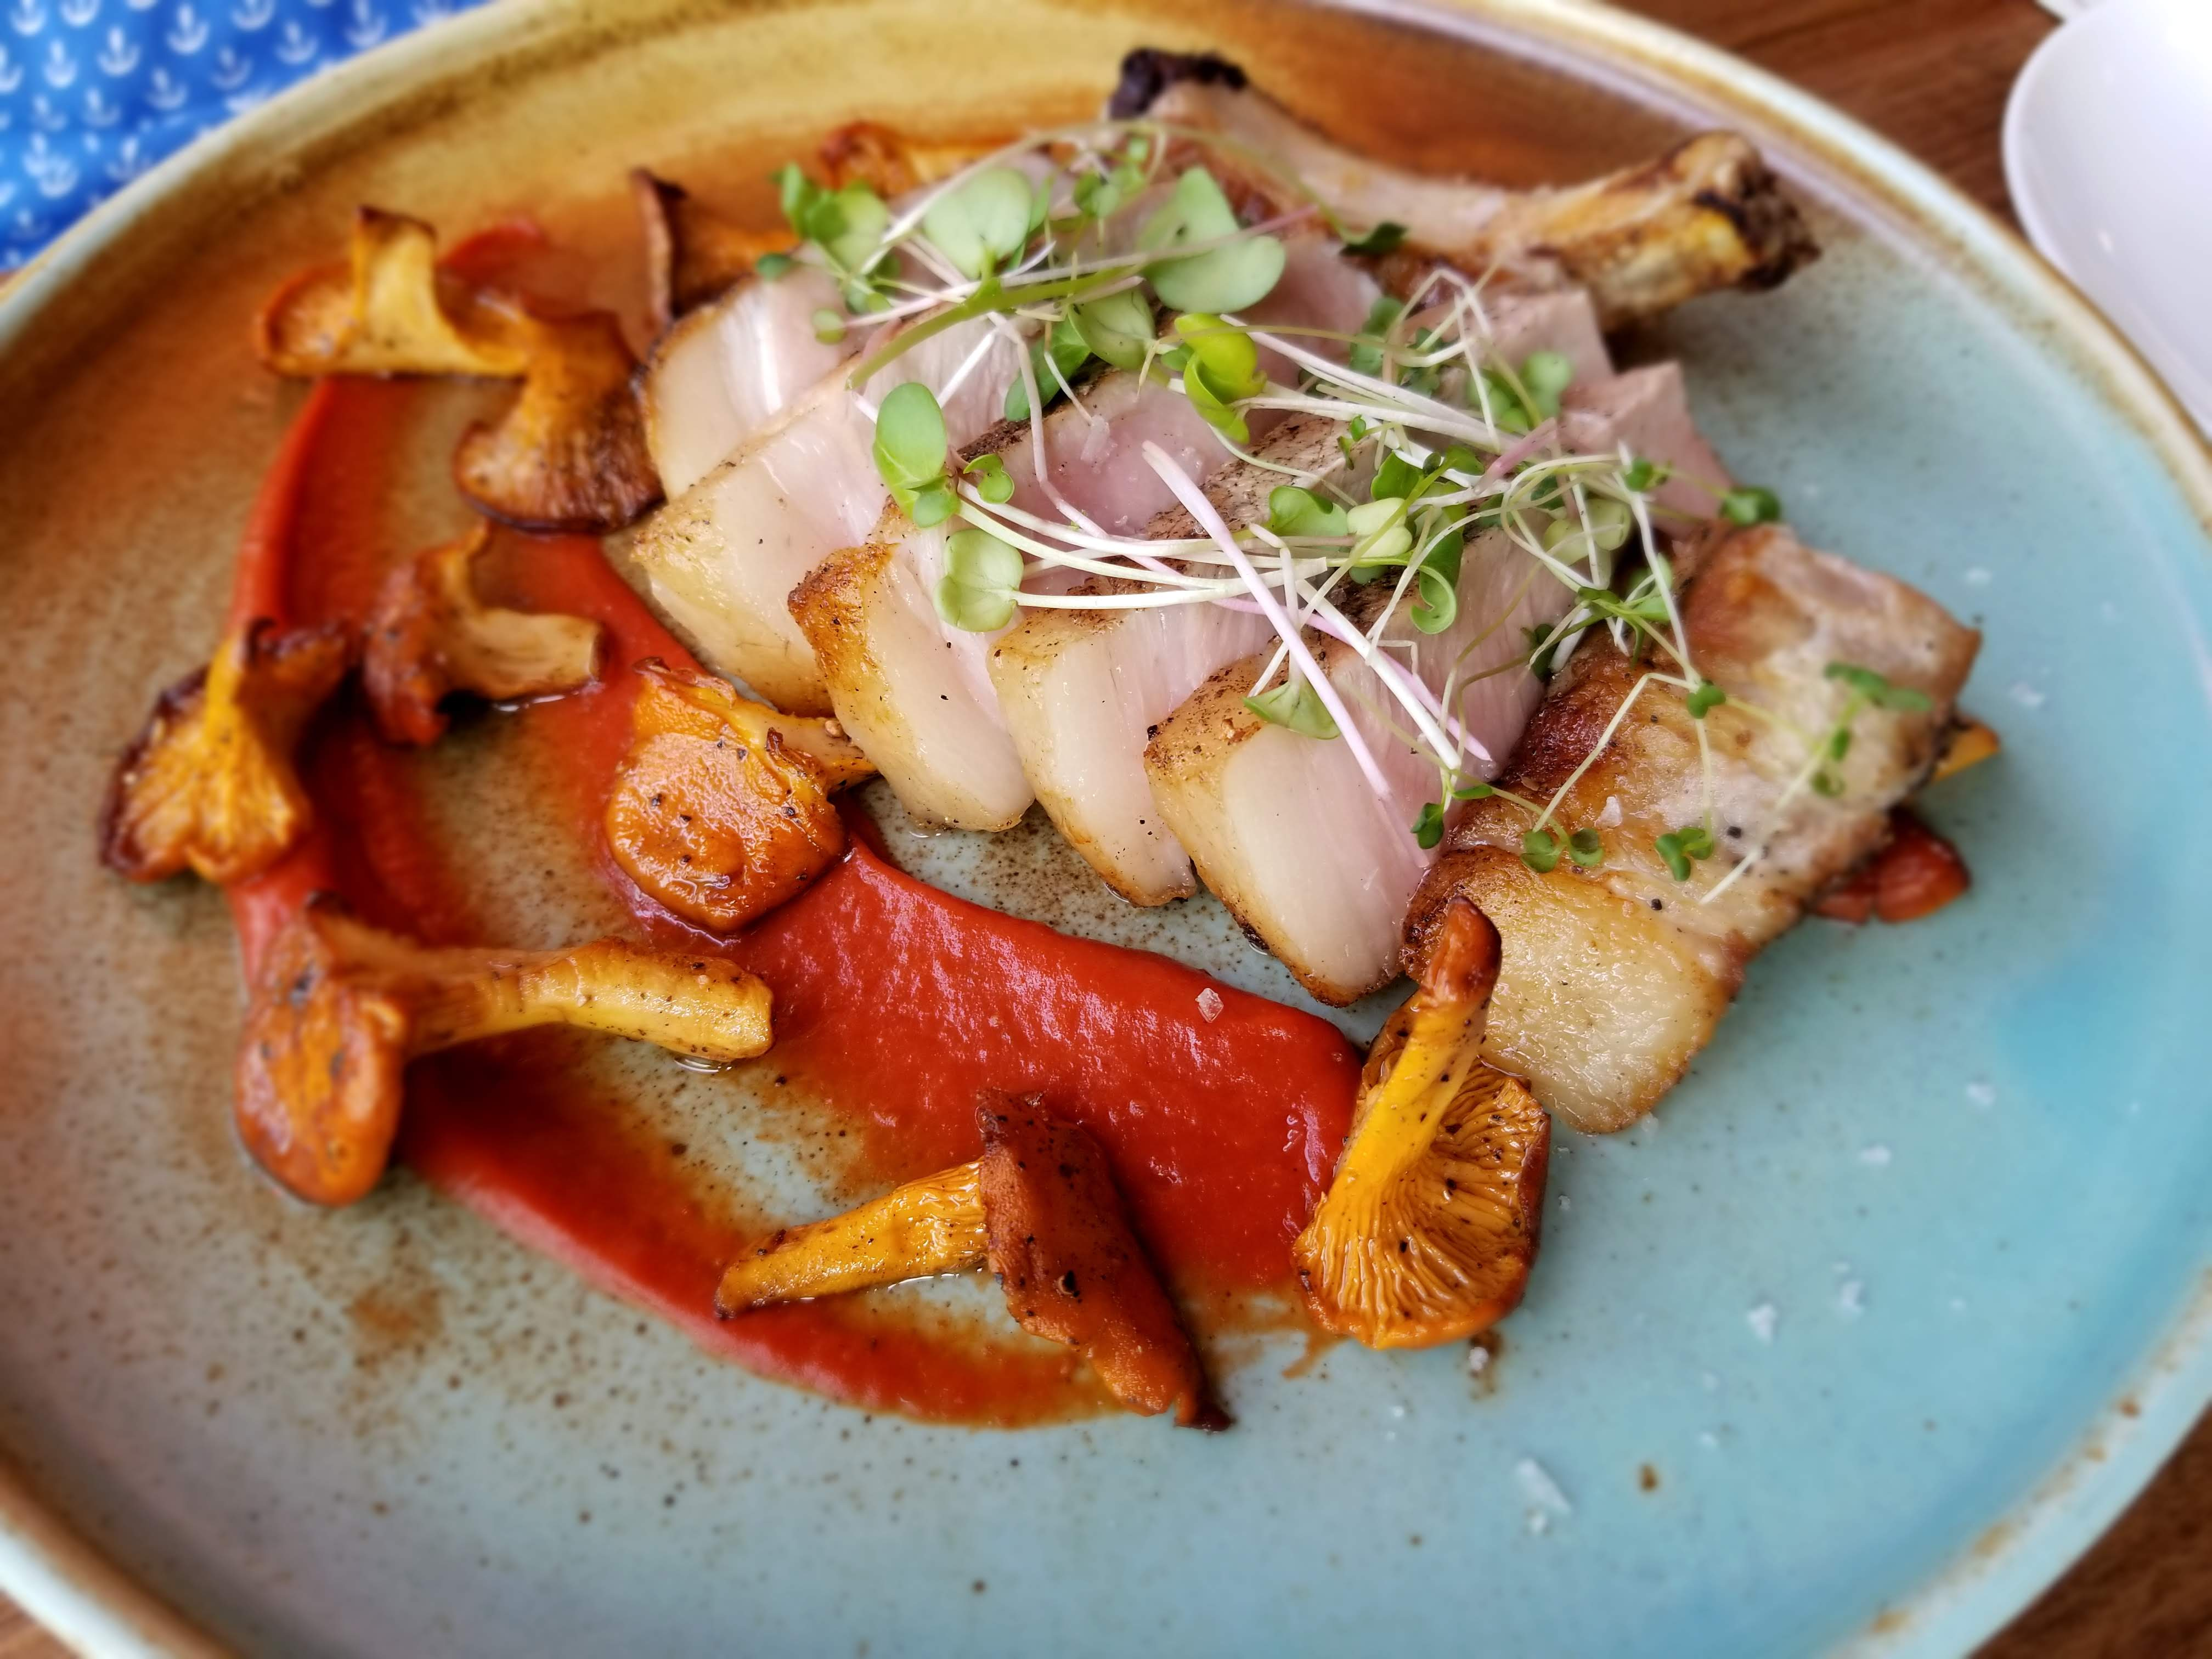 Brined & Smoked Alberta Pork Chop - Brasserie Kensington Summer Feast 2018